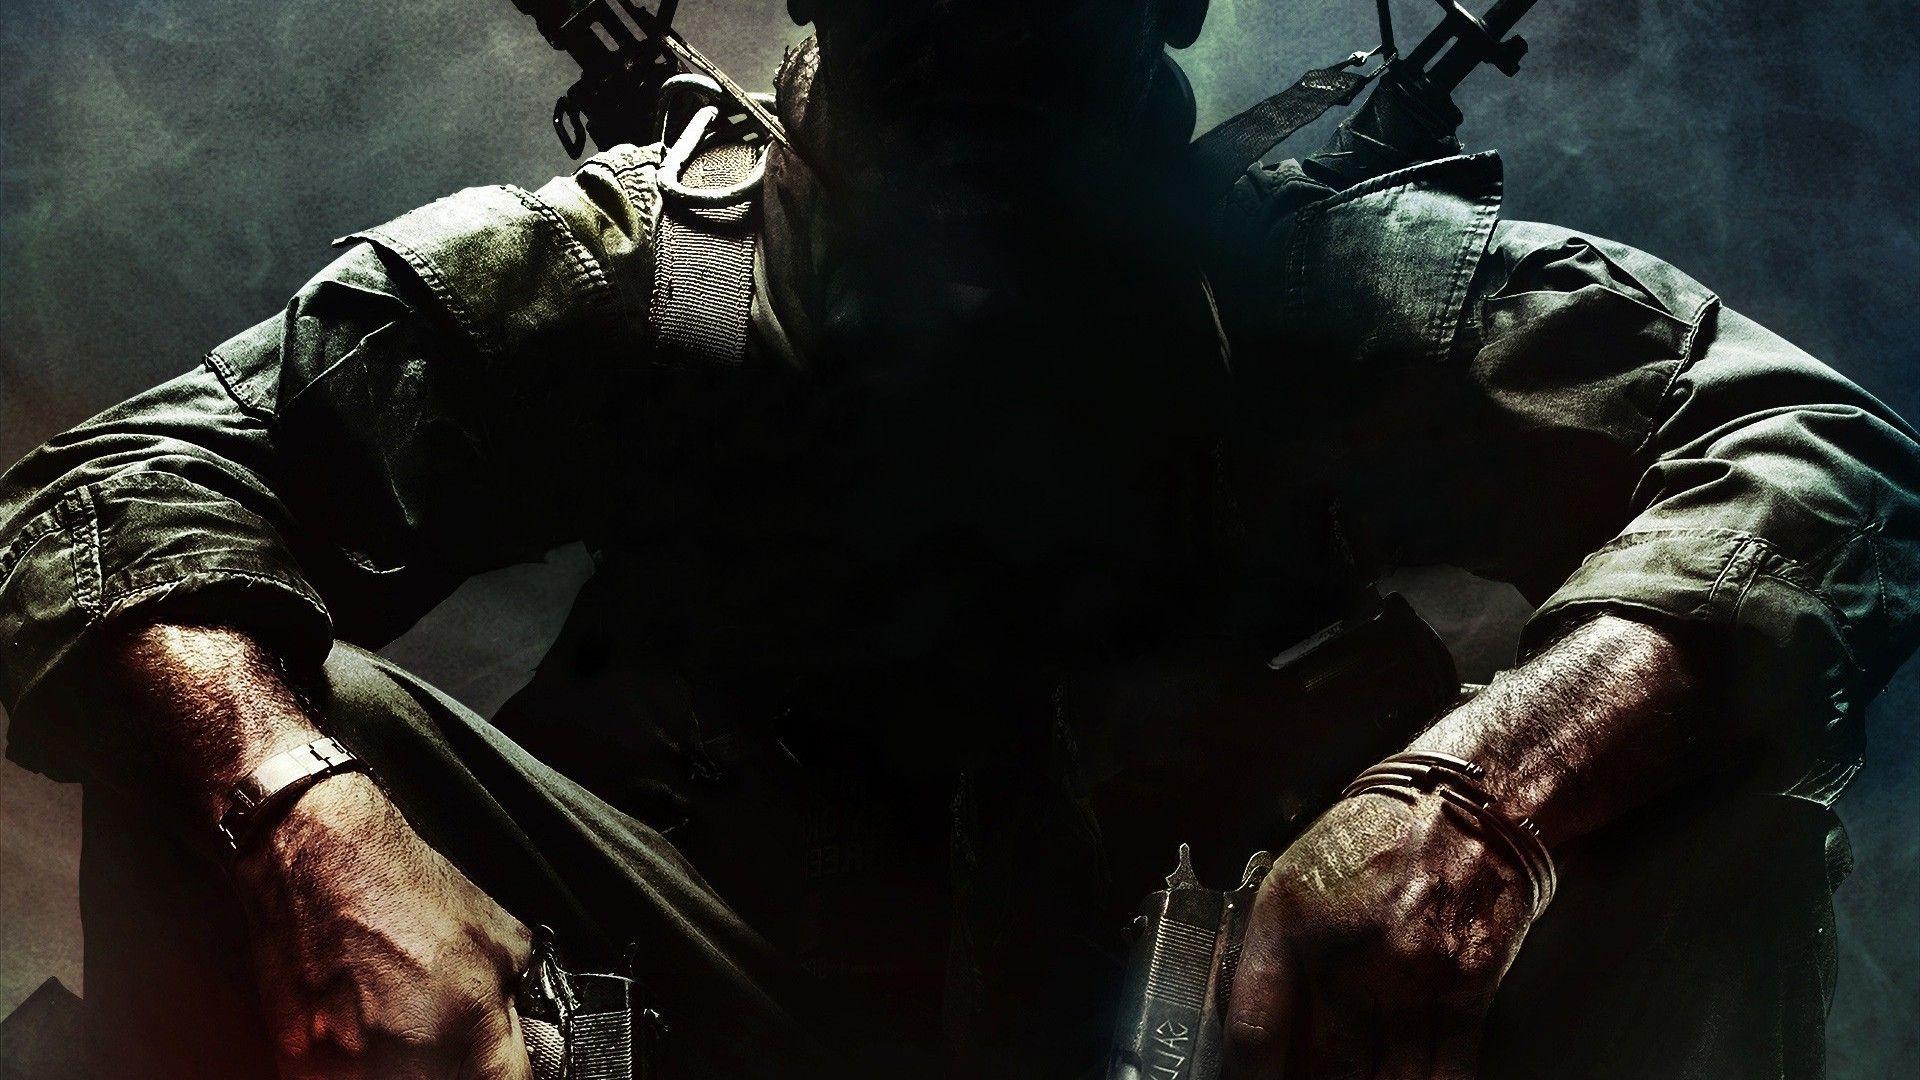 Call Of Duty Black Ops Wallpaper Hd